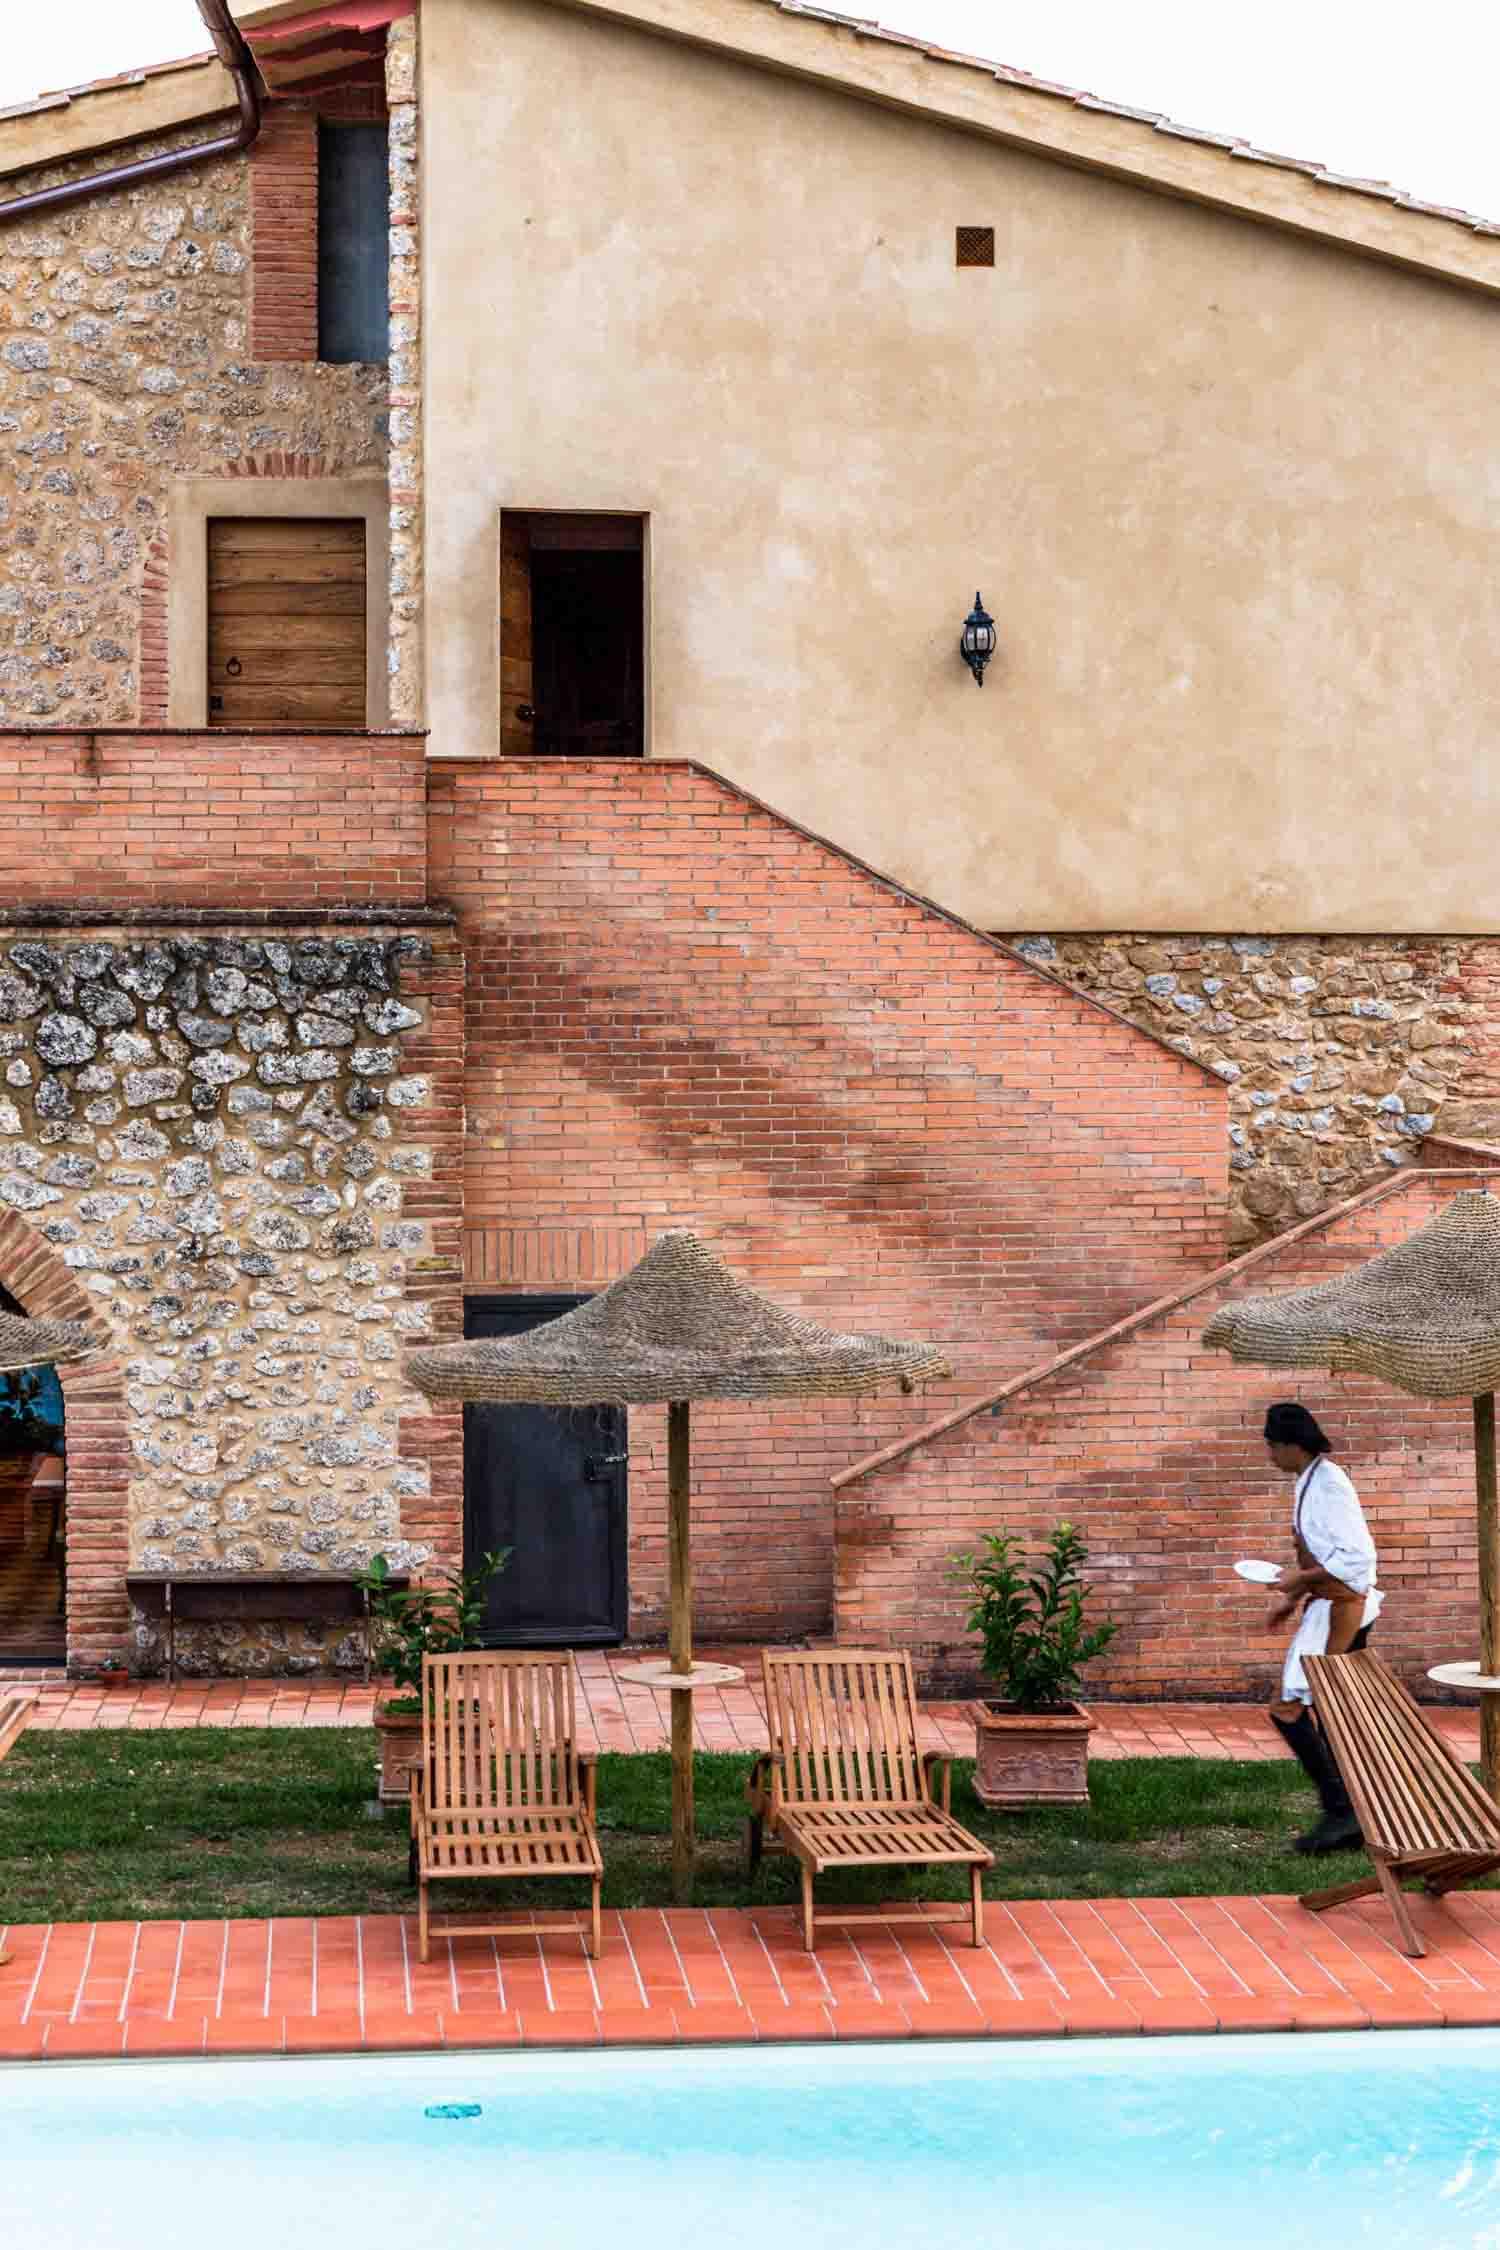 i pini, the organic and vegan farmhouse retreat in San Gimignano, Tuscany, Italy. #tuscany #travel #italy #italianfarmhouse #olivegroves #organicoliveoil #vineyards #italyinautumn #veganrestaurant #vegantravel #italytravel #veganitaly #vegantuscany #veganhotel #ecotourism #organichotel #veganhotel #veganretreat #veganbedandbreakfast #sangimignano